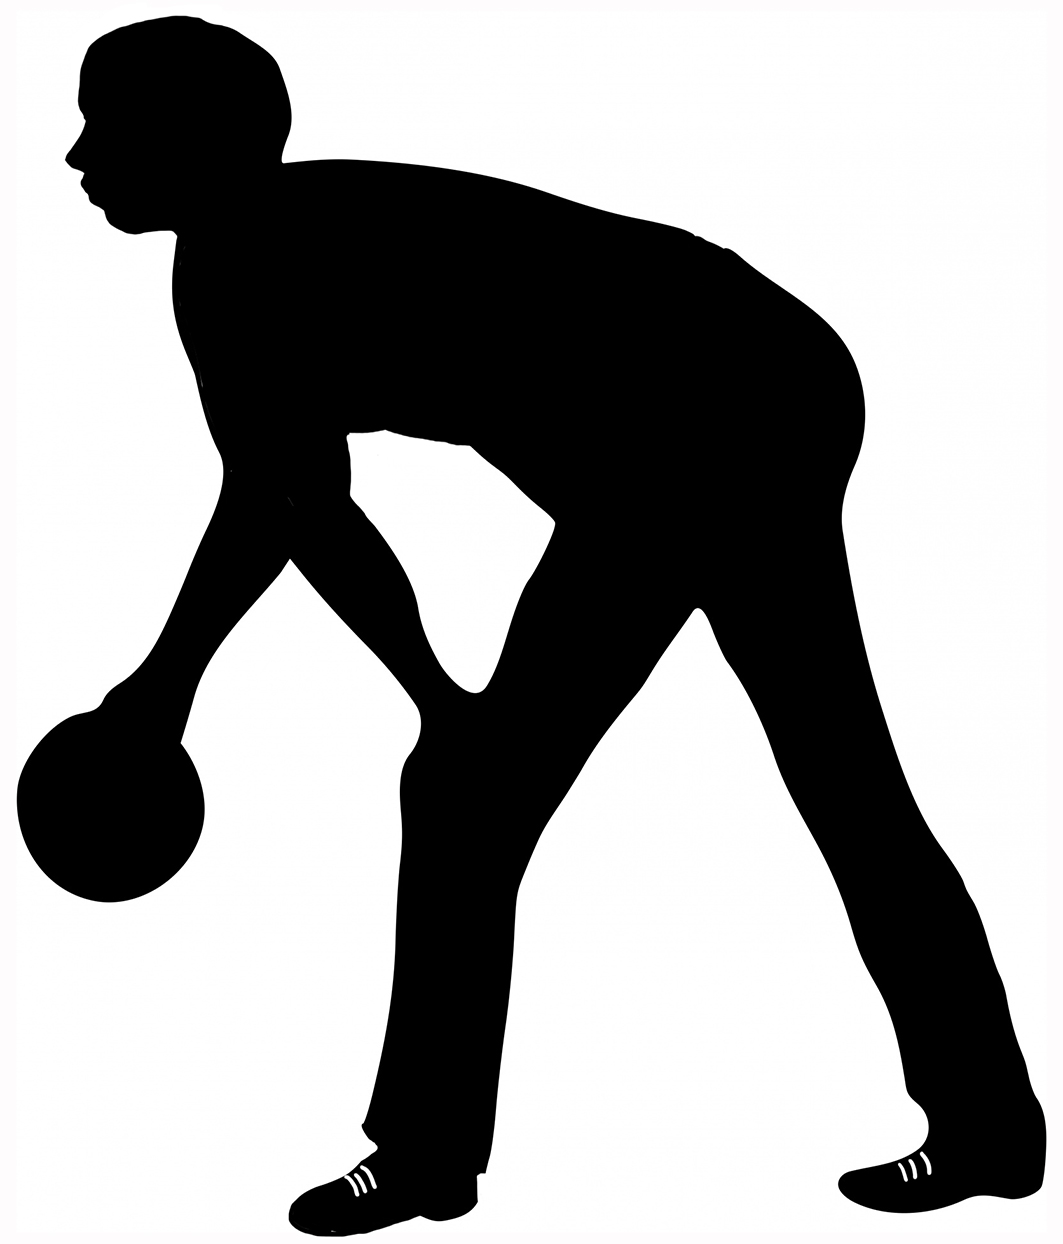 Bowling man. Clipart